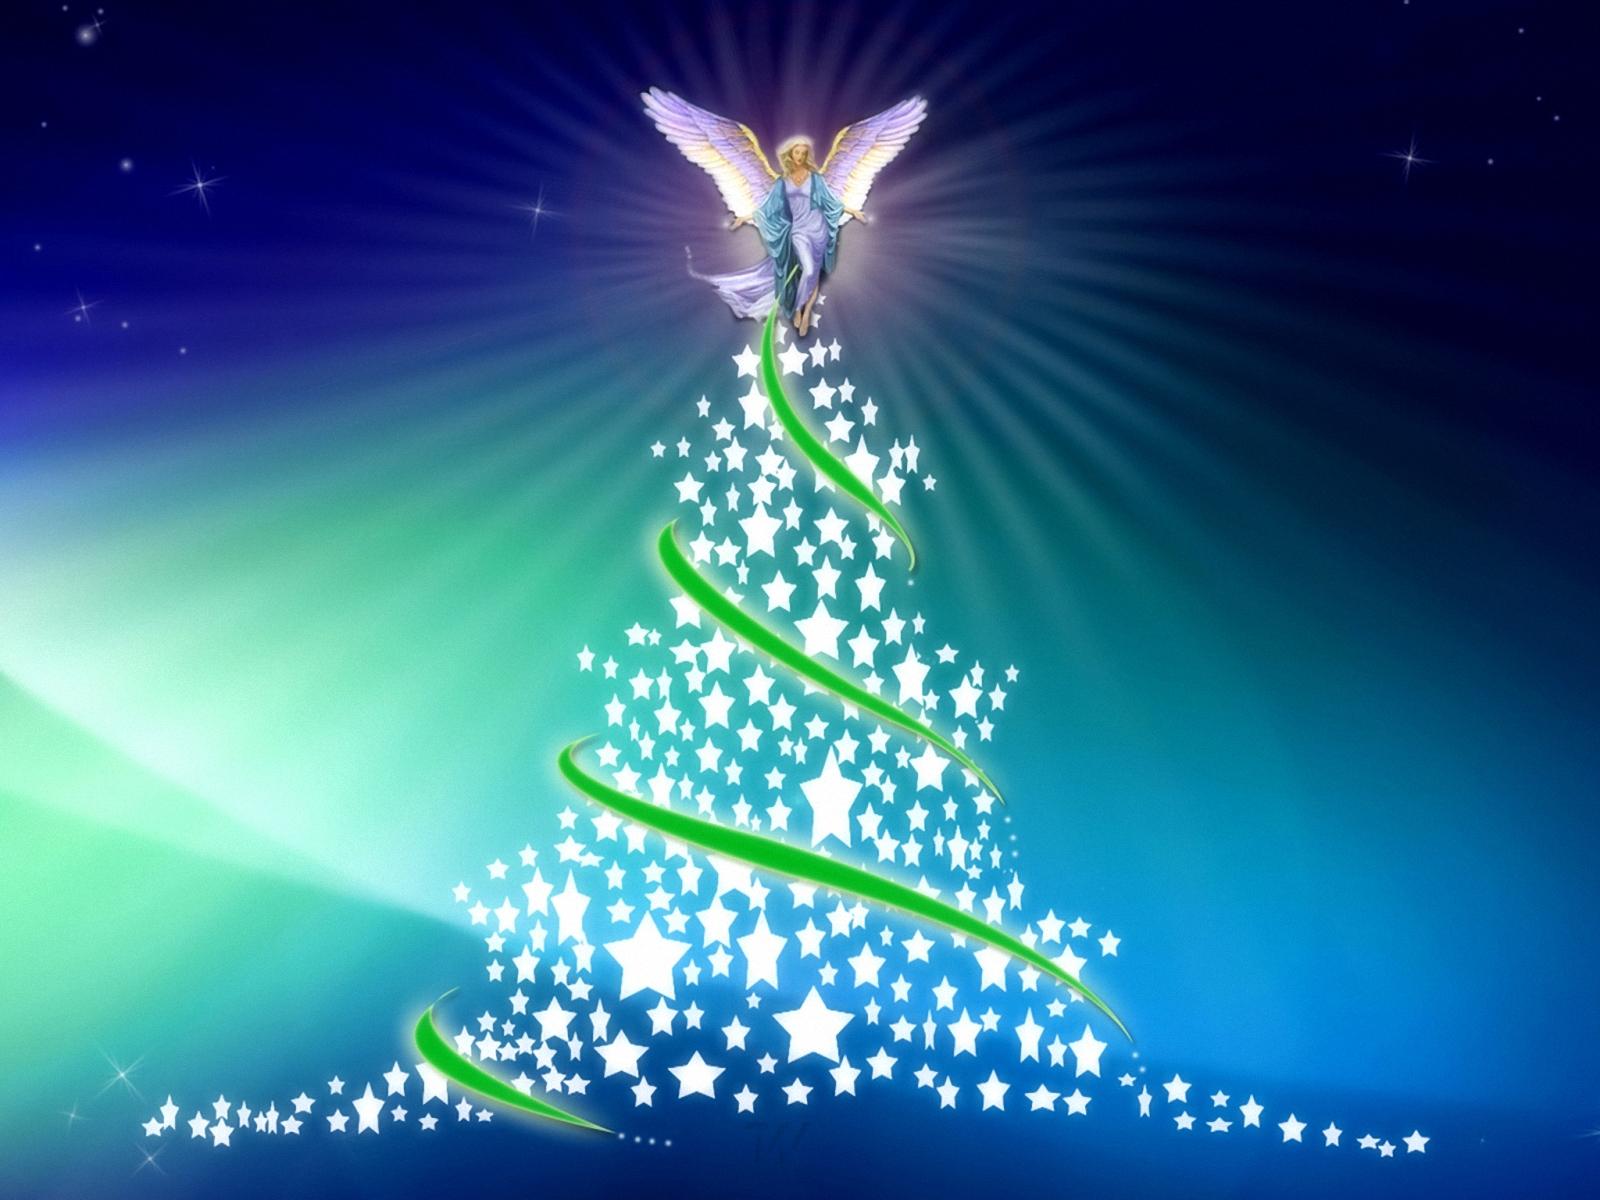 Fondos De Pantalla Navidenos Gratis: Fondo De Pantalla Angel De Navidad 1600x1200